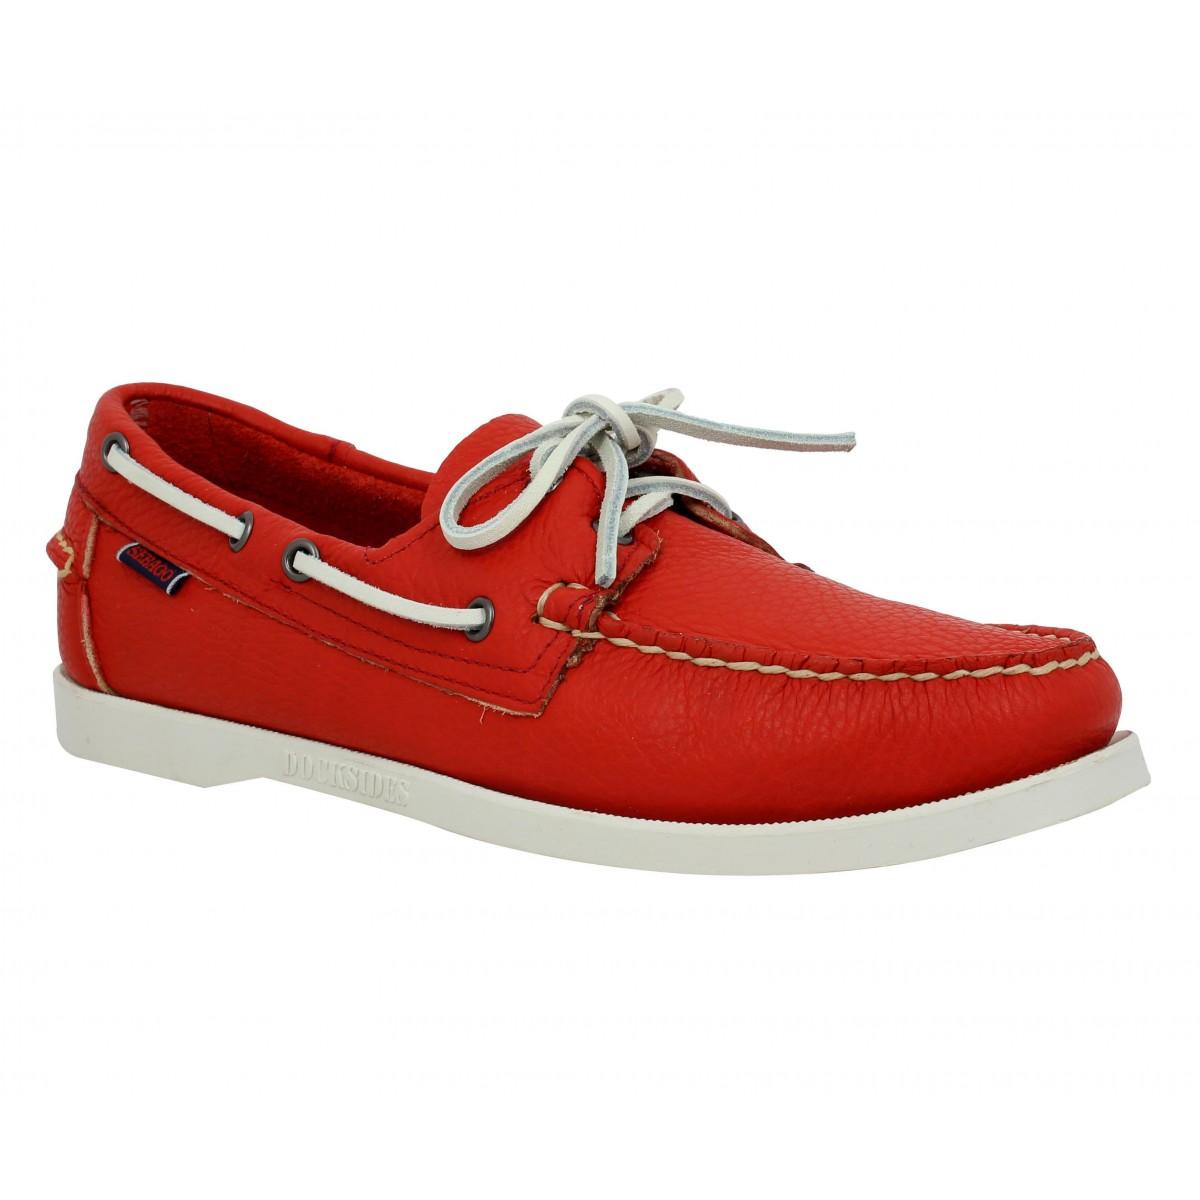 Chaussures bateaux SEBAGO Docksides cuir Homme Rouge Vif